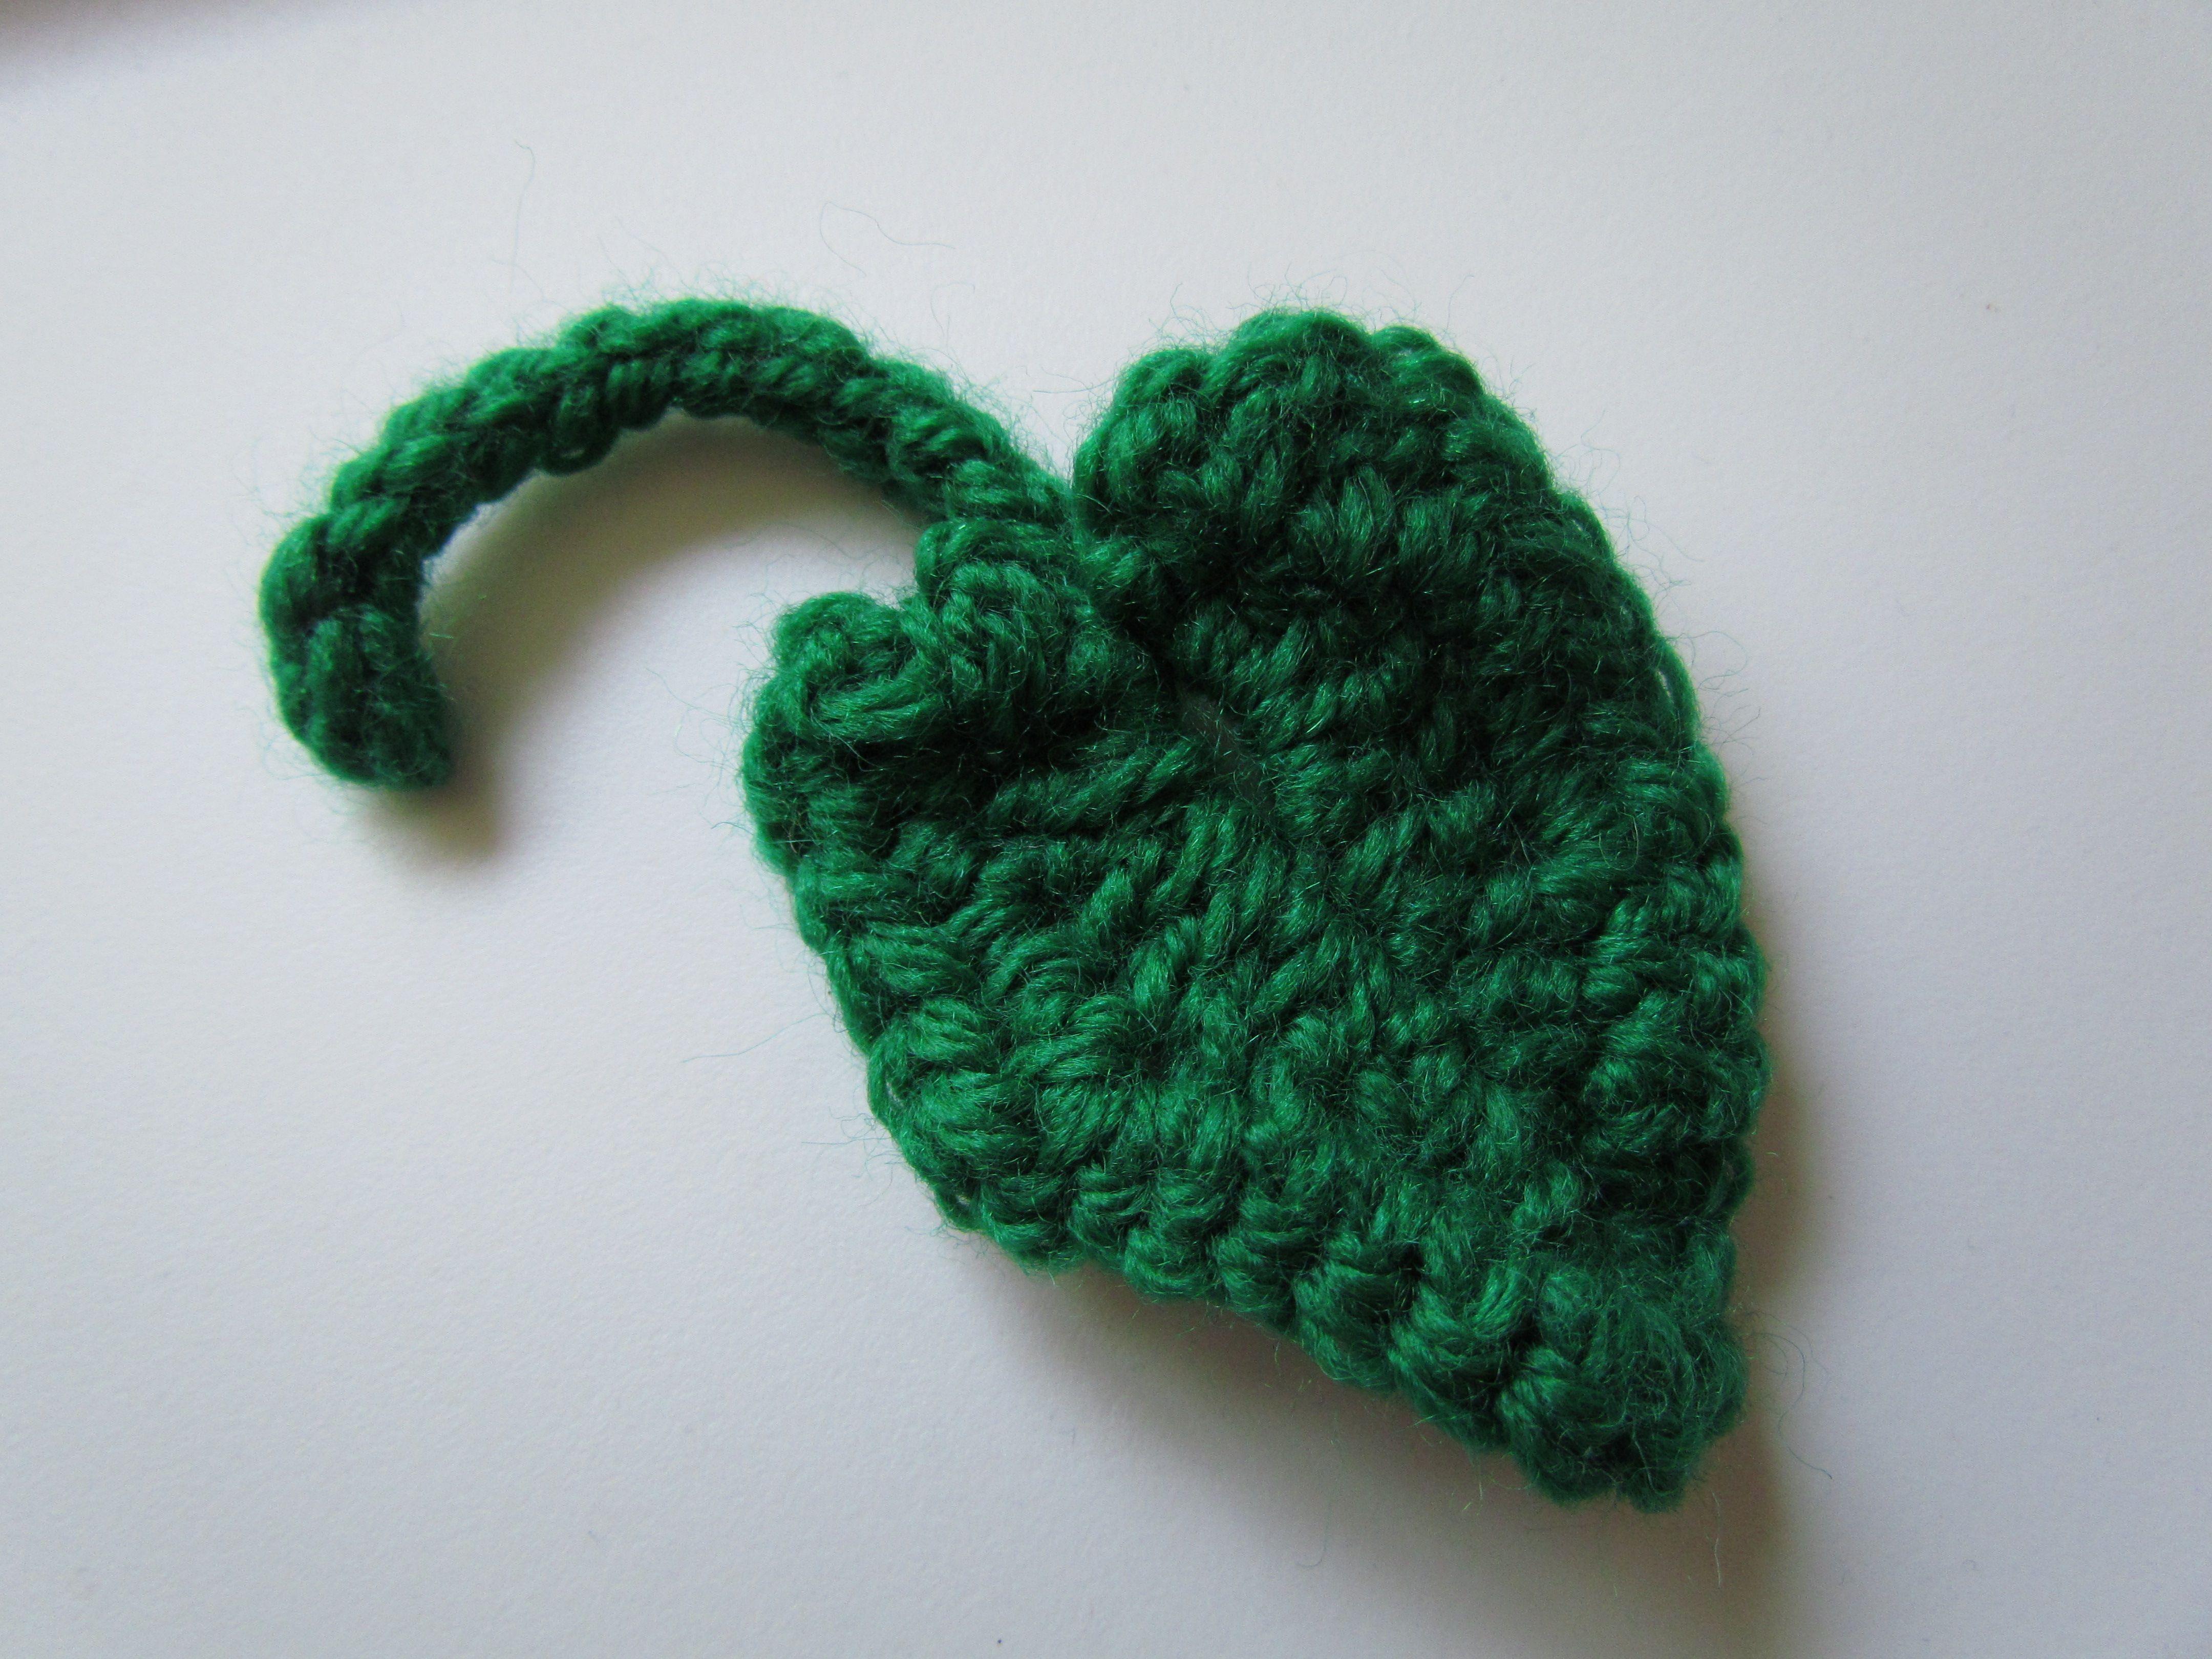 Crochet leaves fall pumpkin leaf free crochet pattern crochet leaves fall pumpkin leaf free crochet pattern ambassador crochet bankloansurffo Images